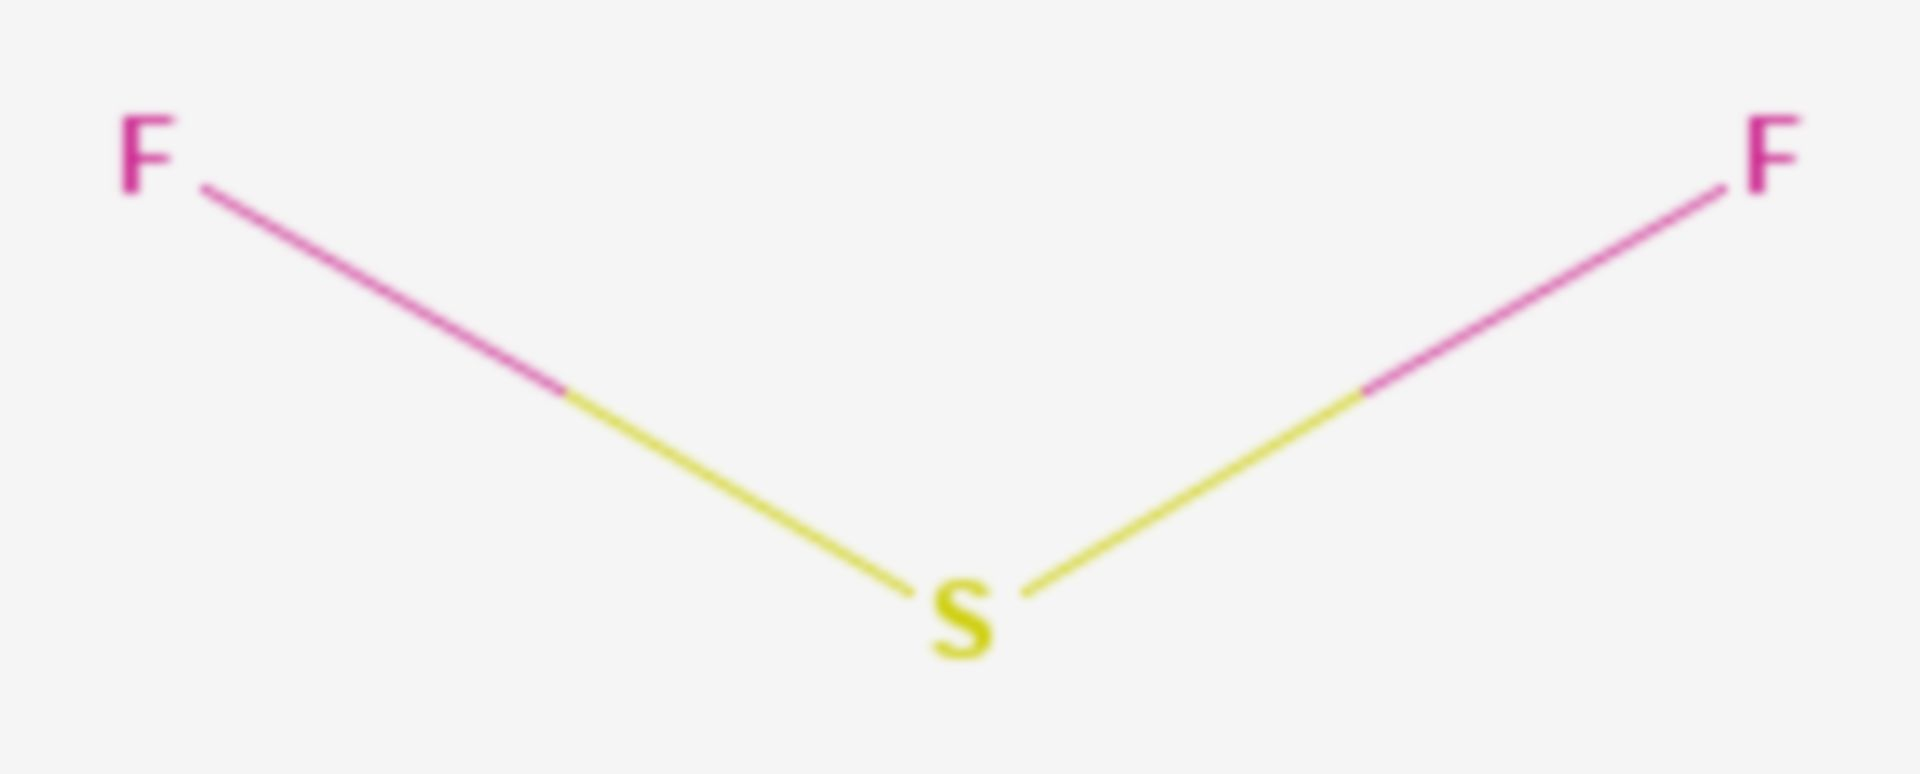 Schwefeldifluorid (Strukturformel)